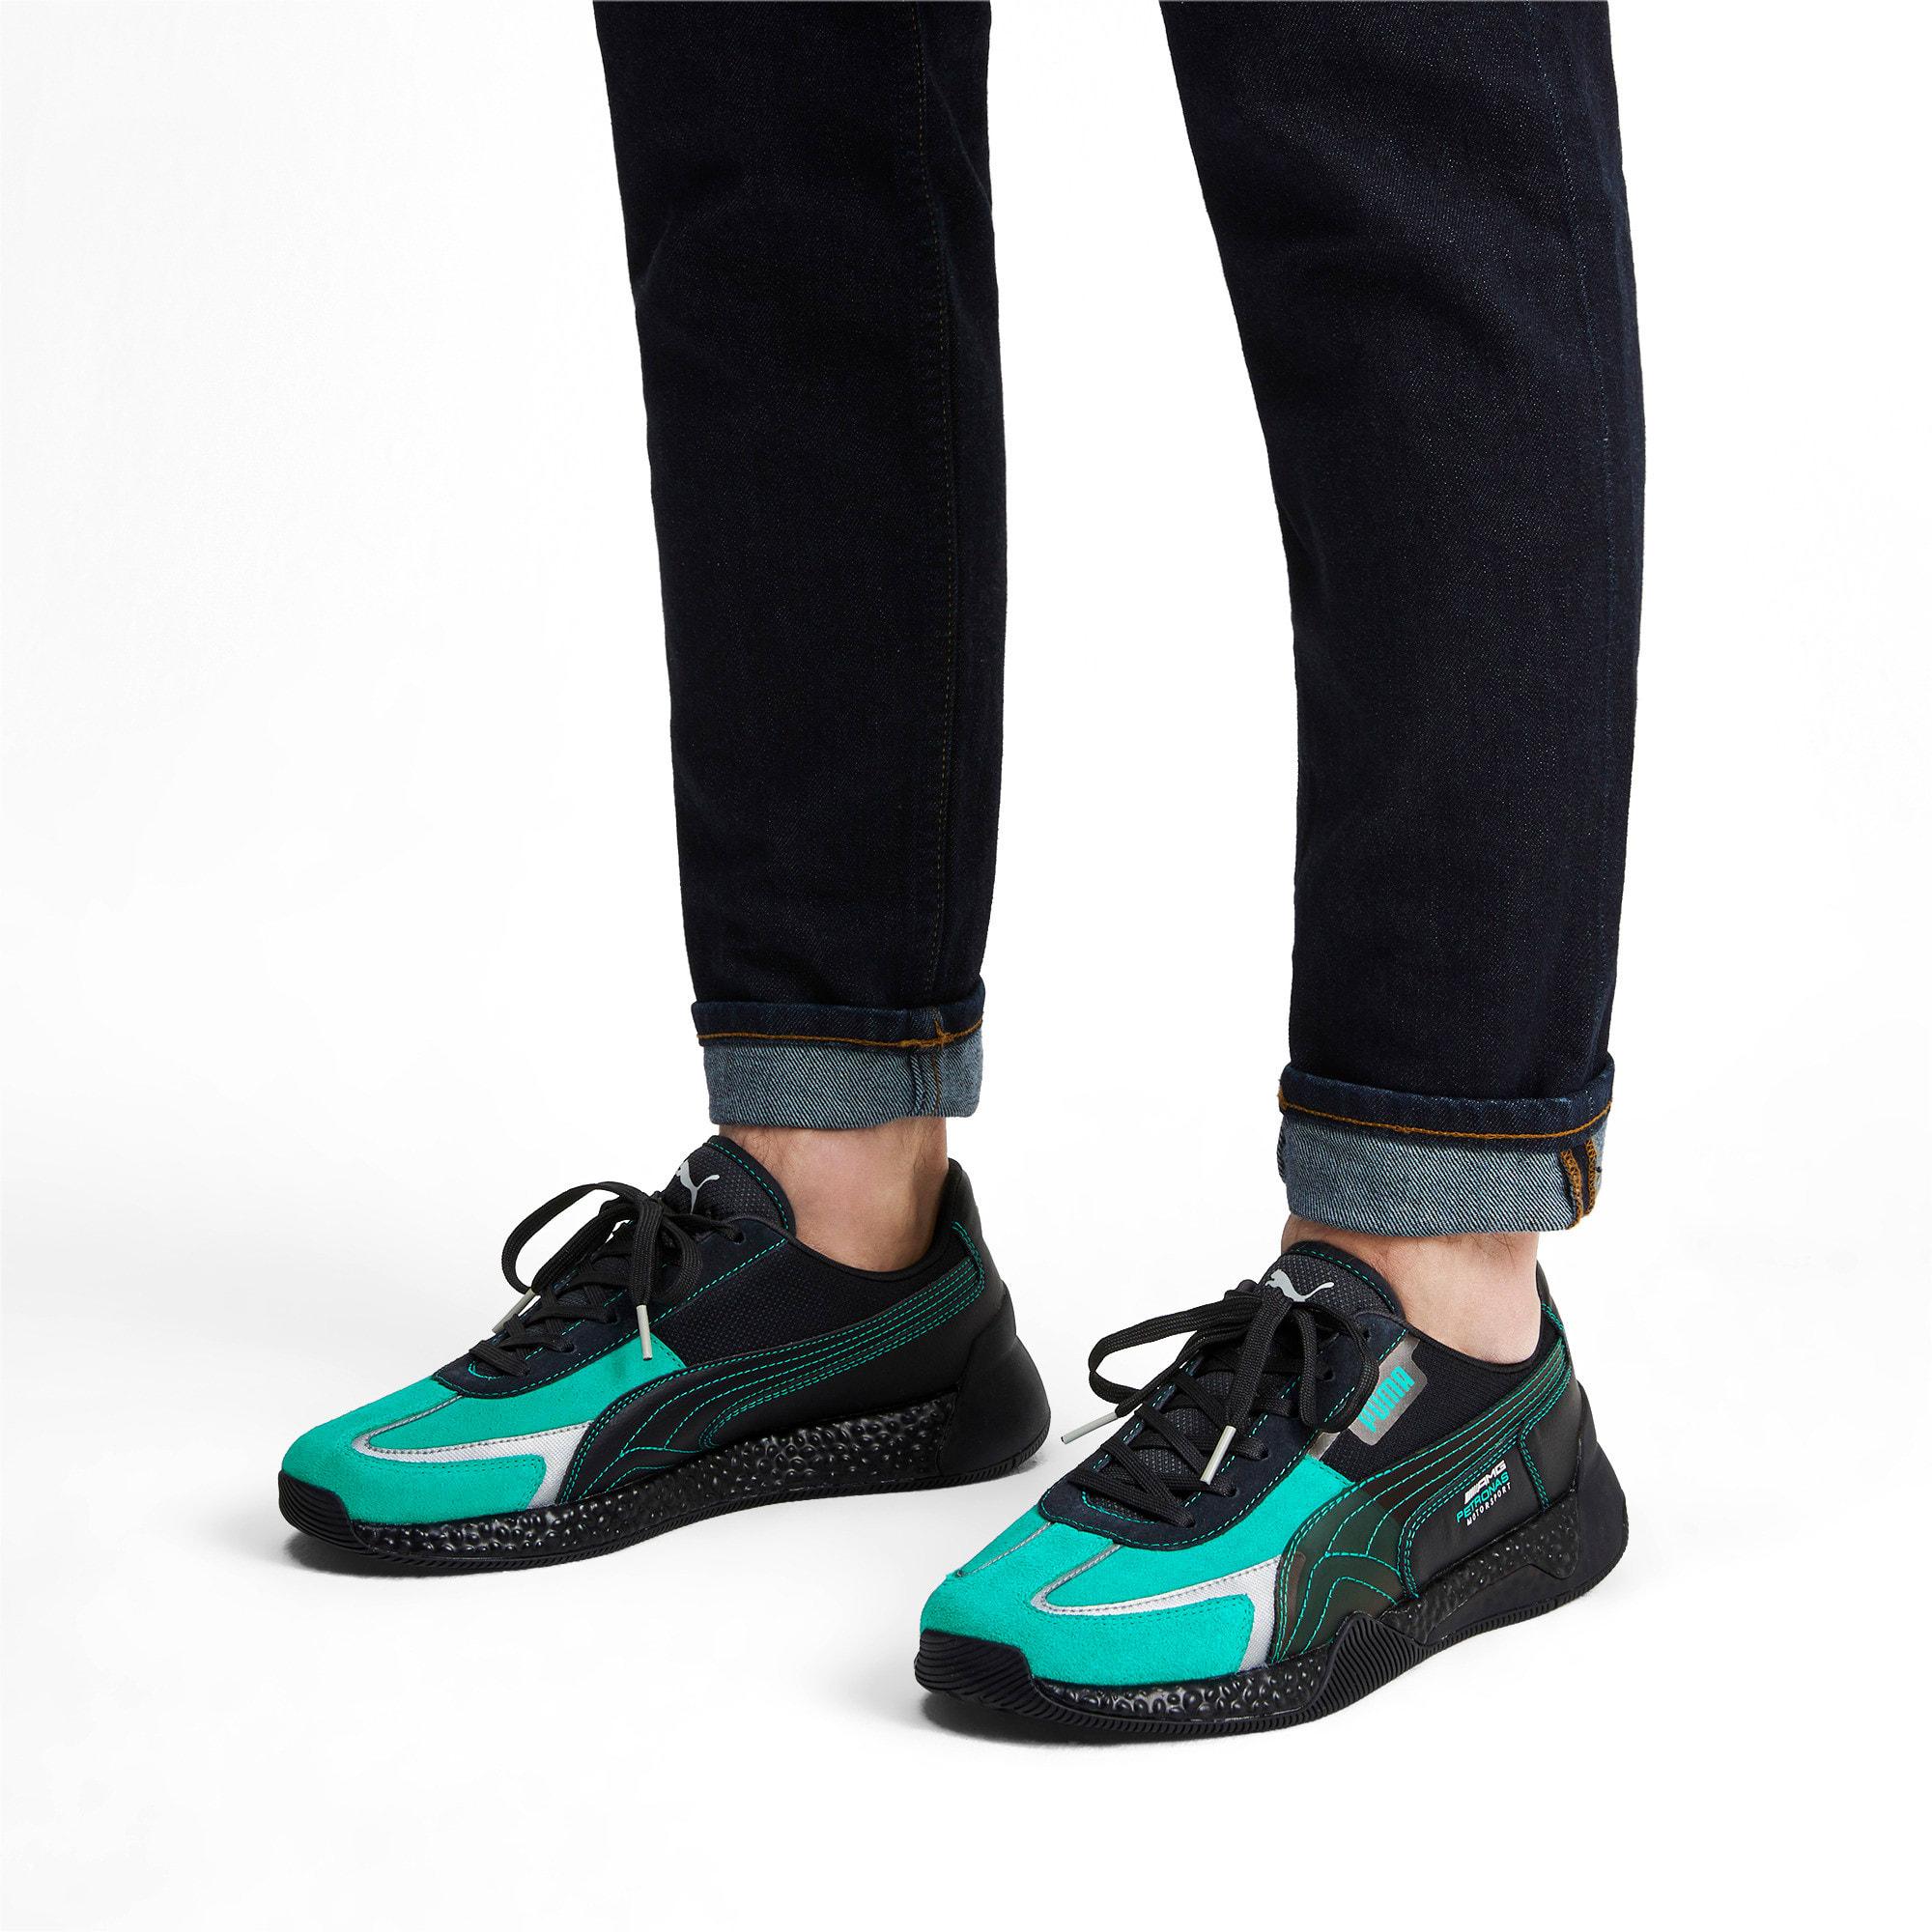 Thumbnail 2 of Mercedes AMG Petronas Speed HYBRID Running Shoes, Puma Black-Spectra Green, medium